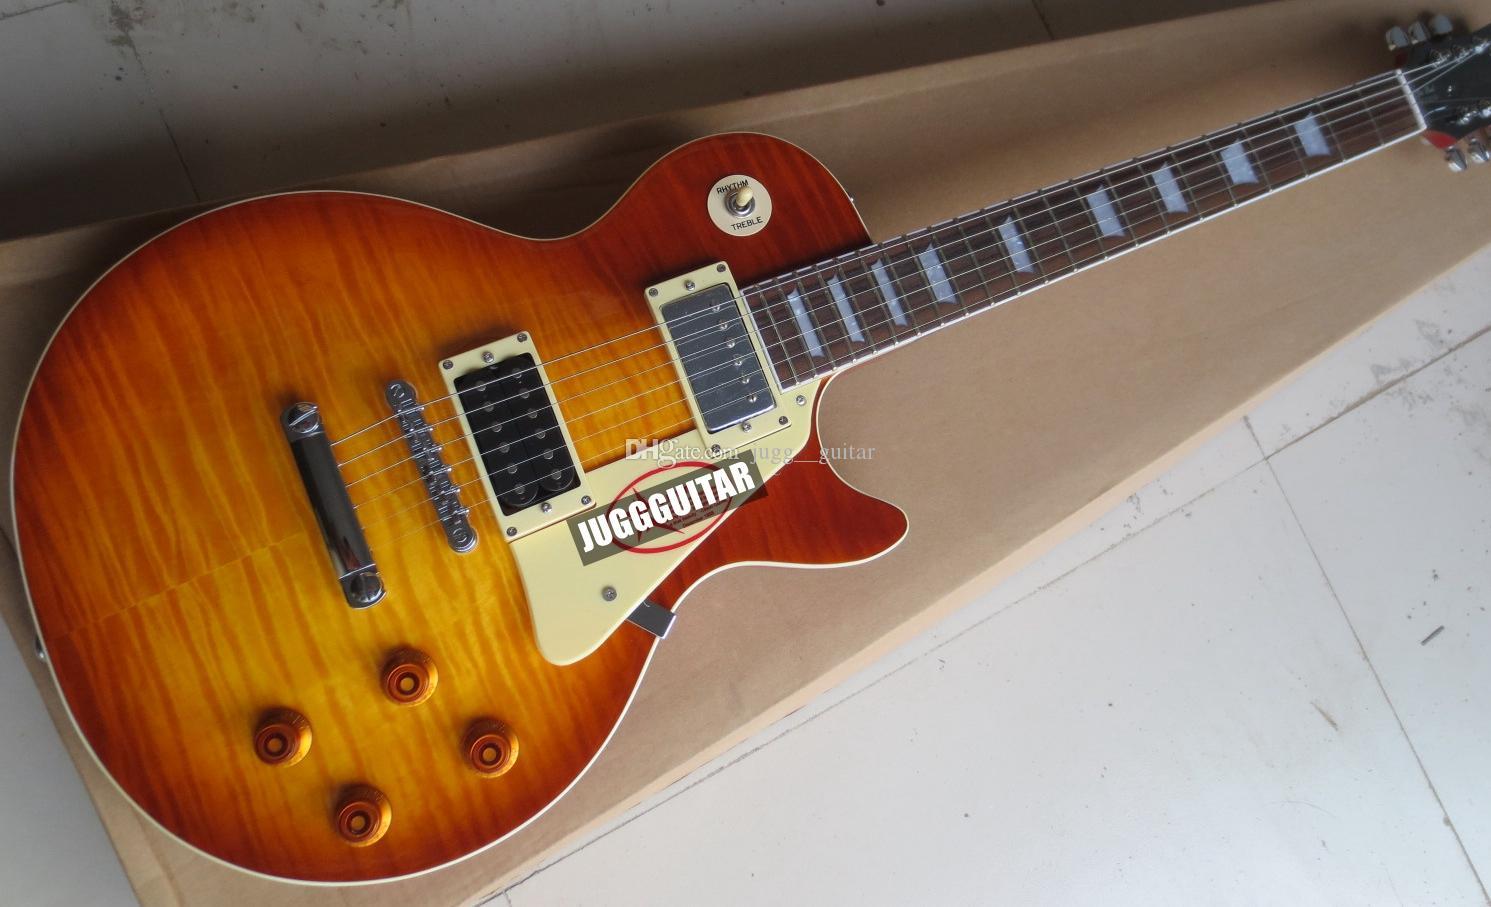 Custom Shop Standard 1959 Jimmy Page Flame Maple Top Cherry Sunburst الغيتار الكهربائي، المستقبلات الكروم الحديثة، الماهوجني الجسم روزوود الأصابع